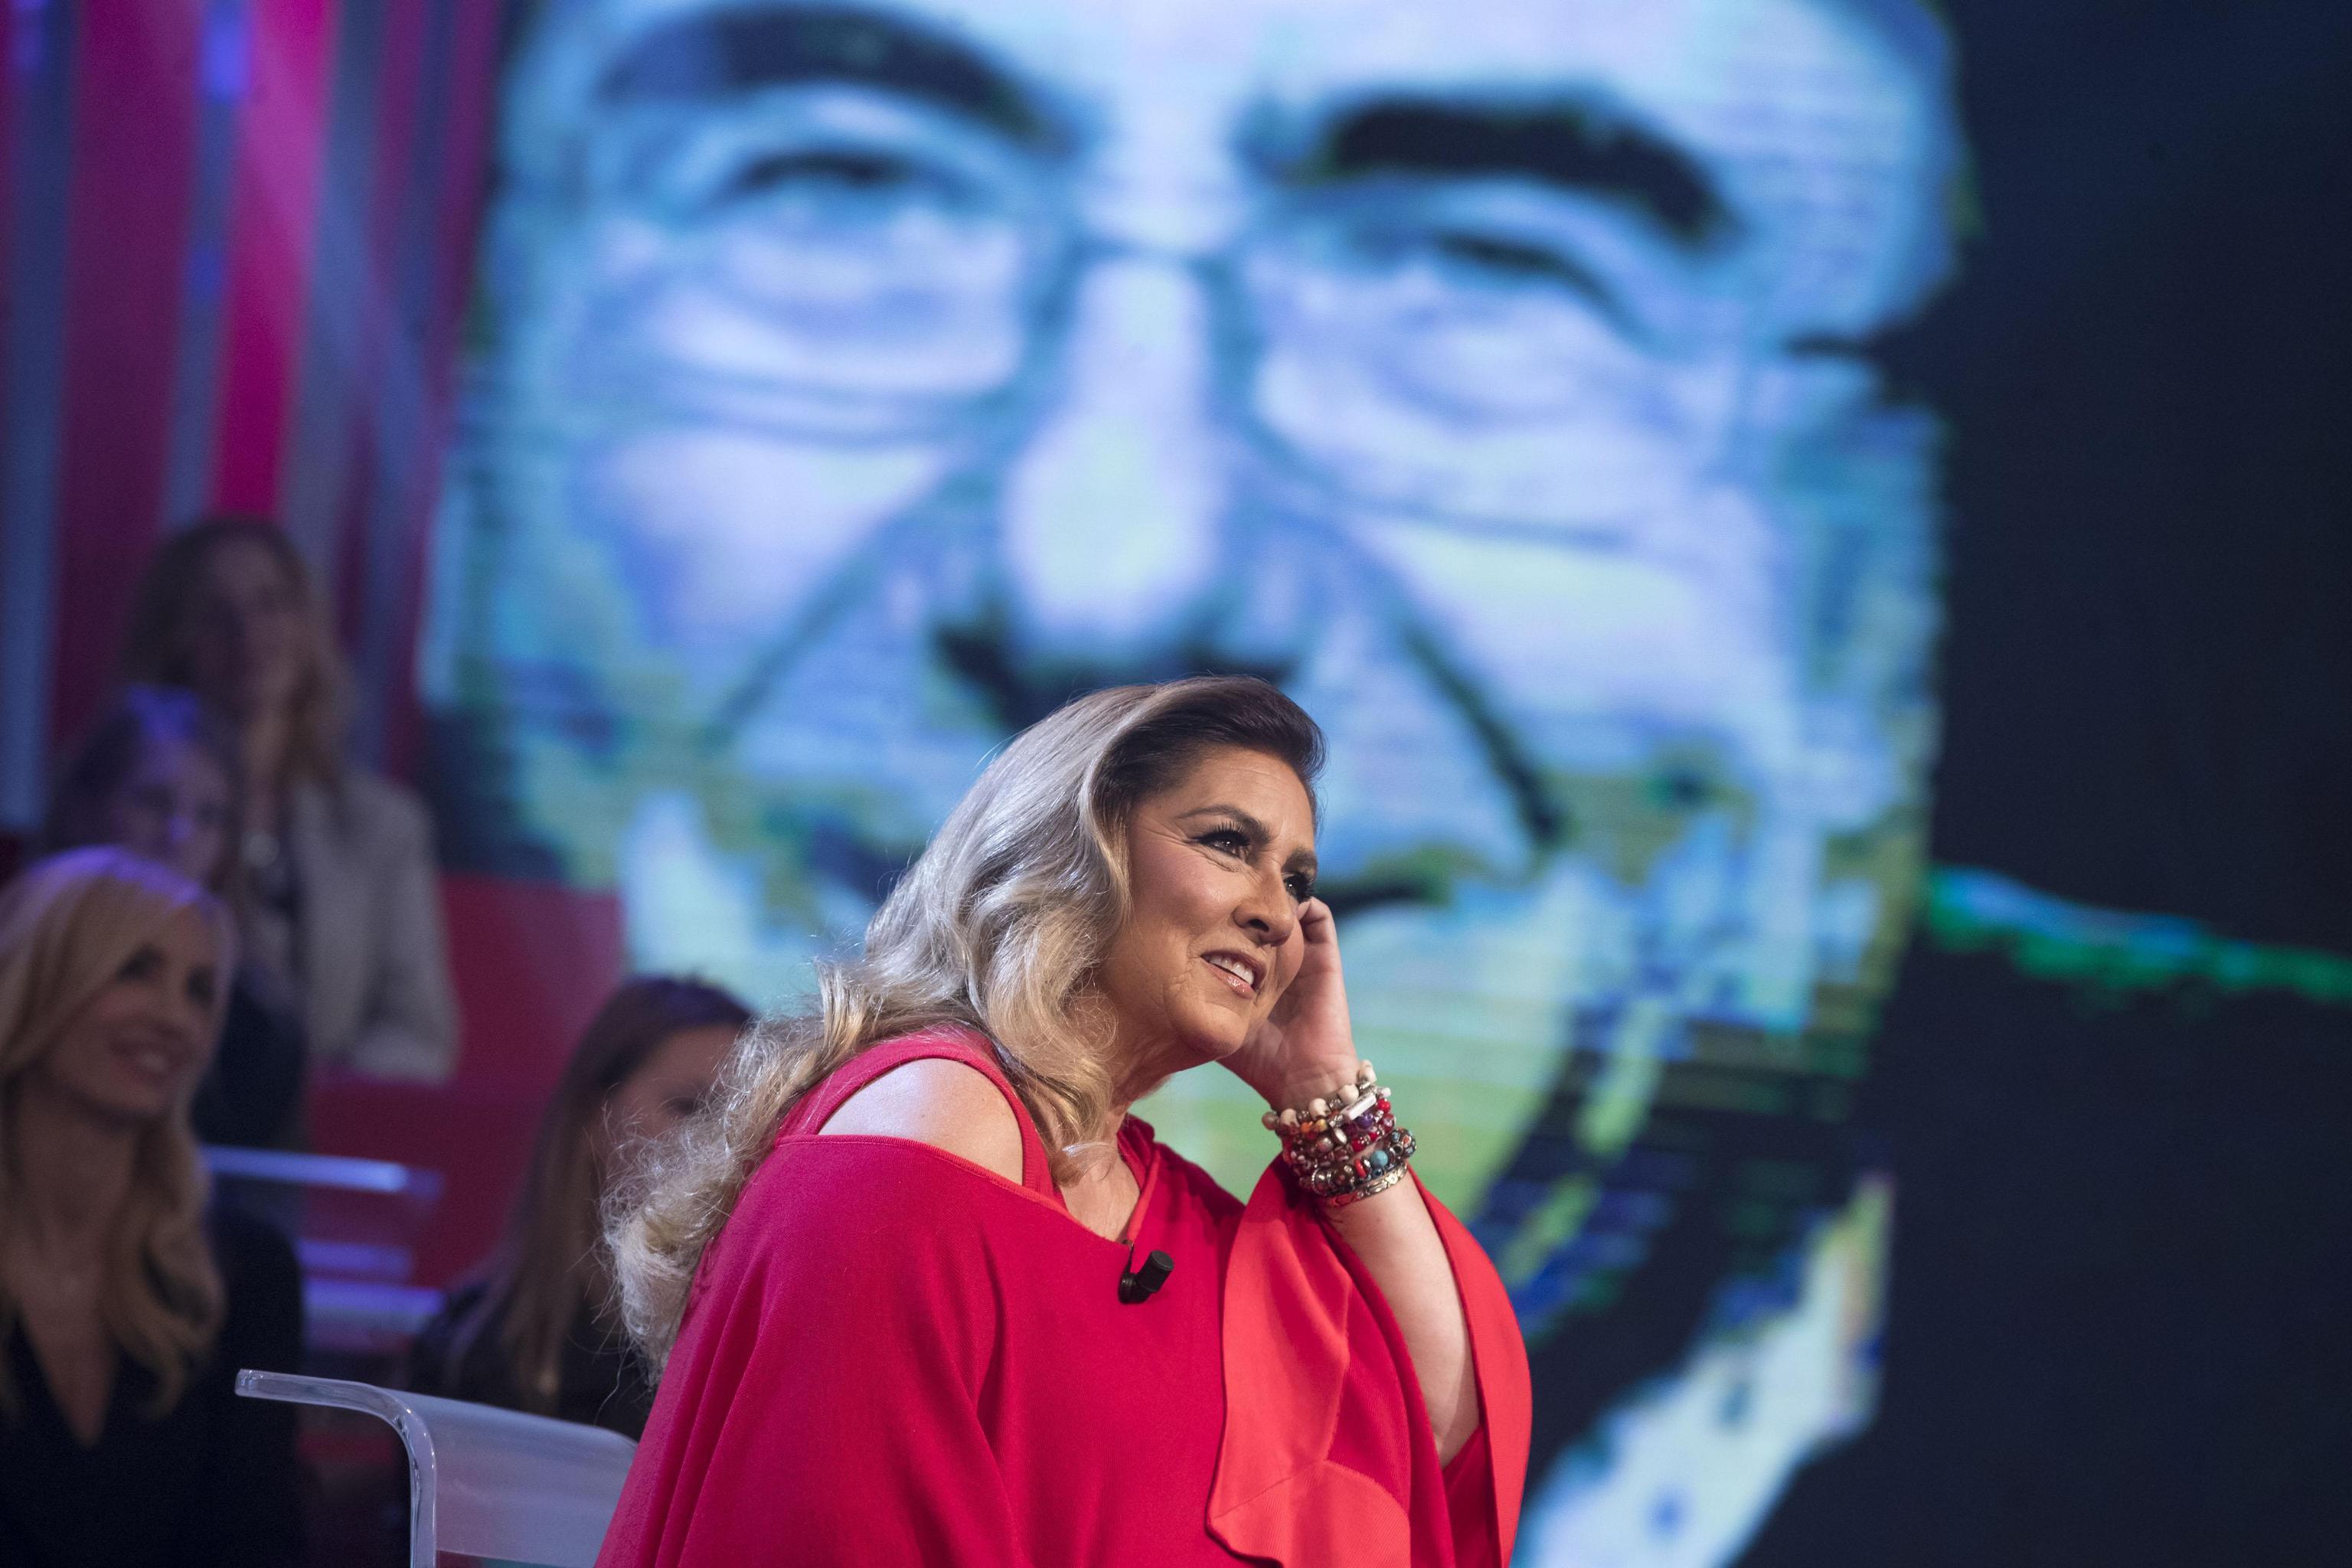 Romina Power e le droghe: 'Ho provato lsd e marijuana', confessa la cantante